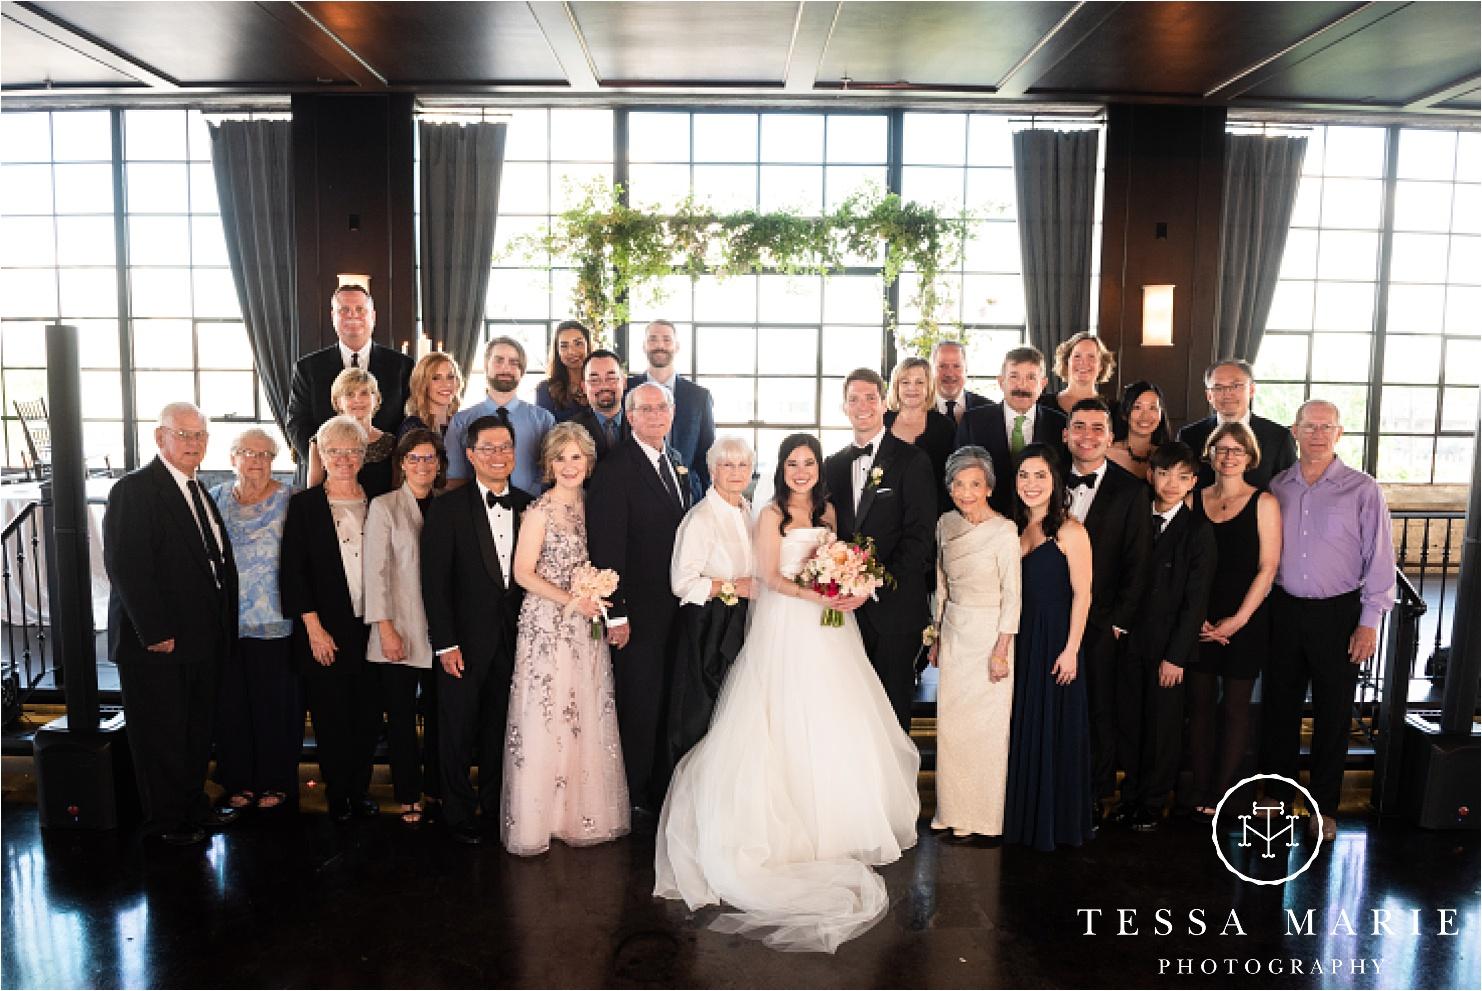 Tessa_marie_weddings_houston_wedding_photographer_The_astorian_0137.jpg